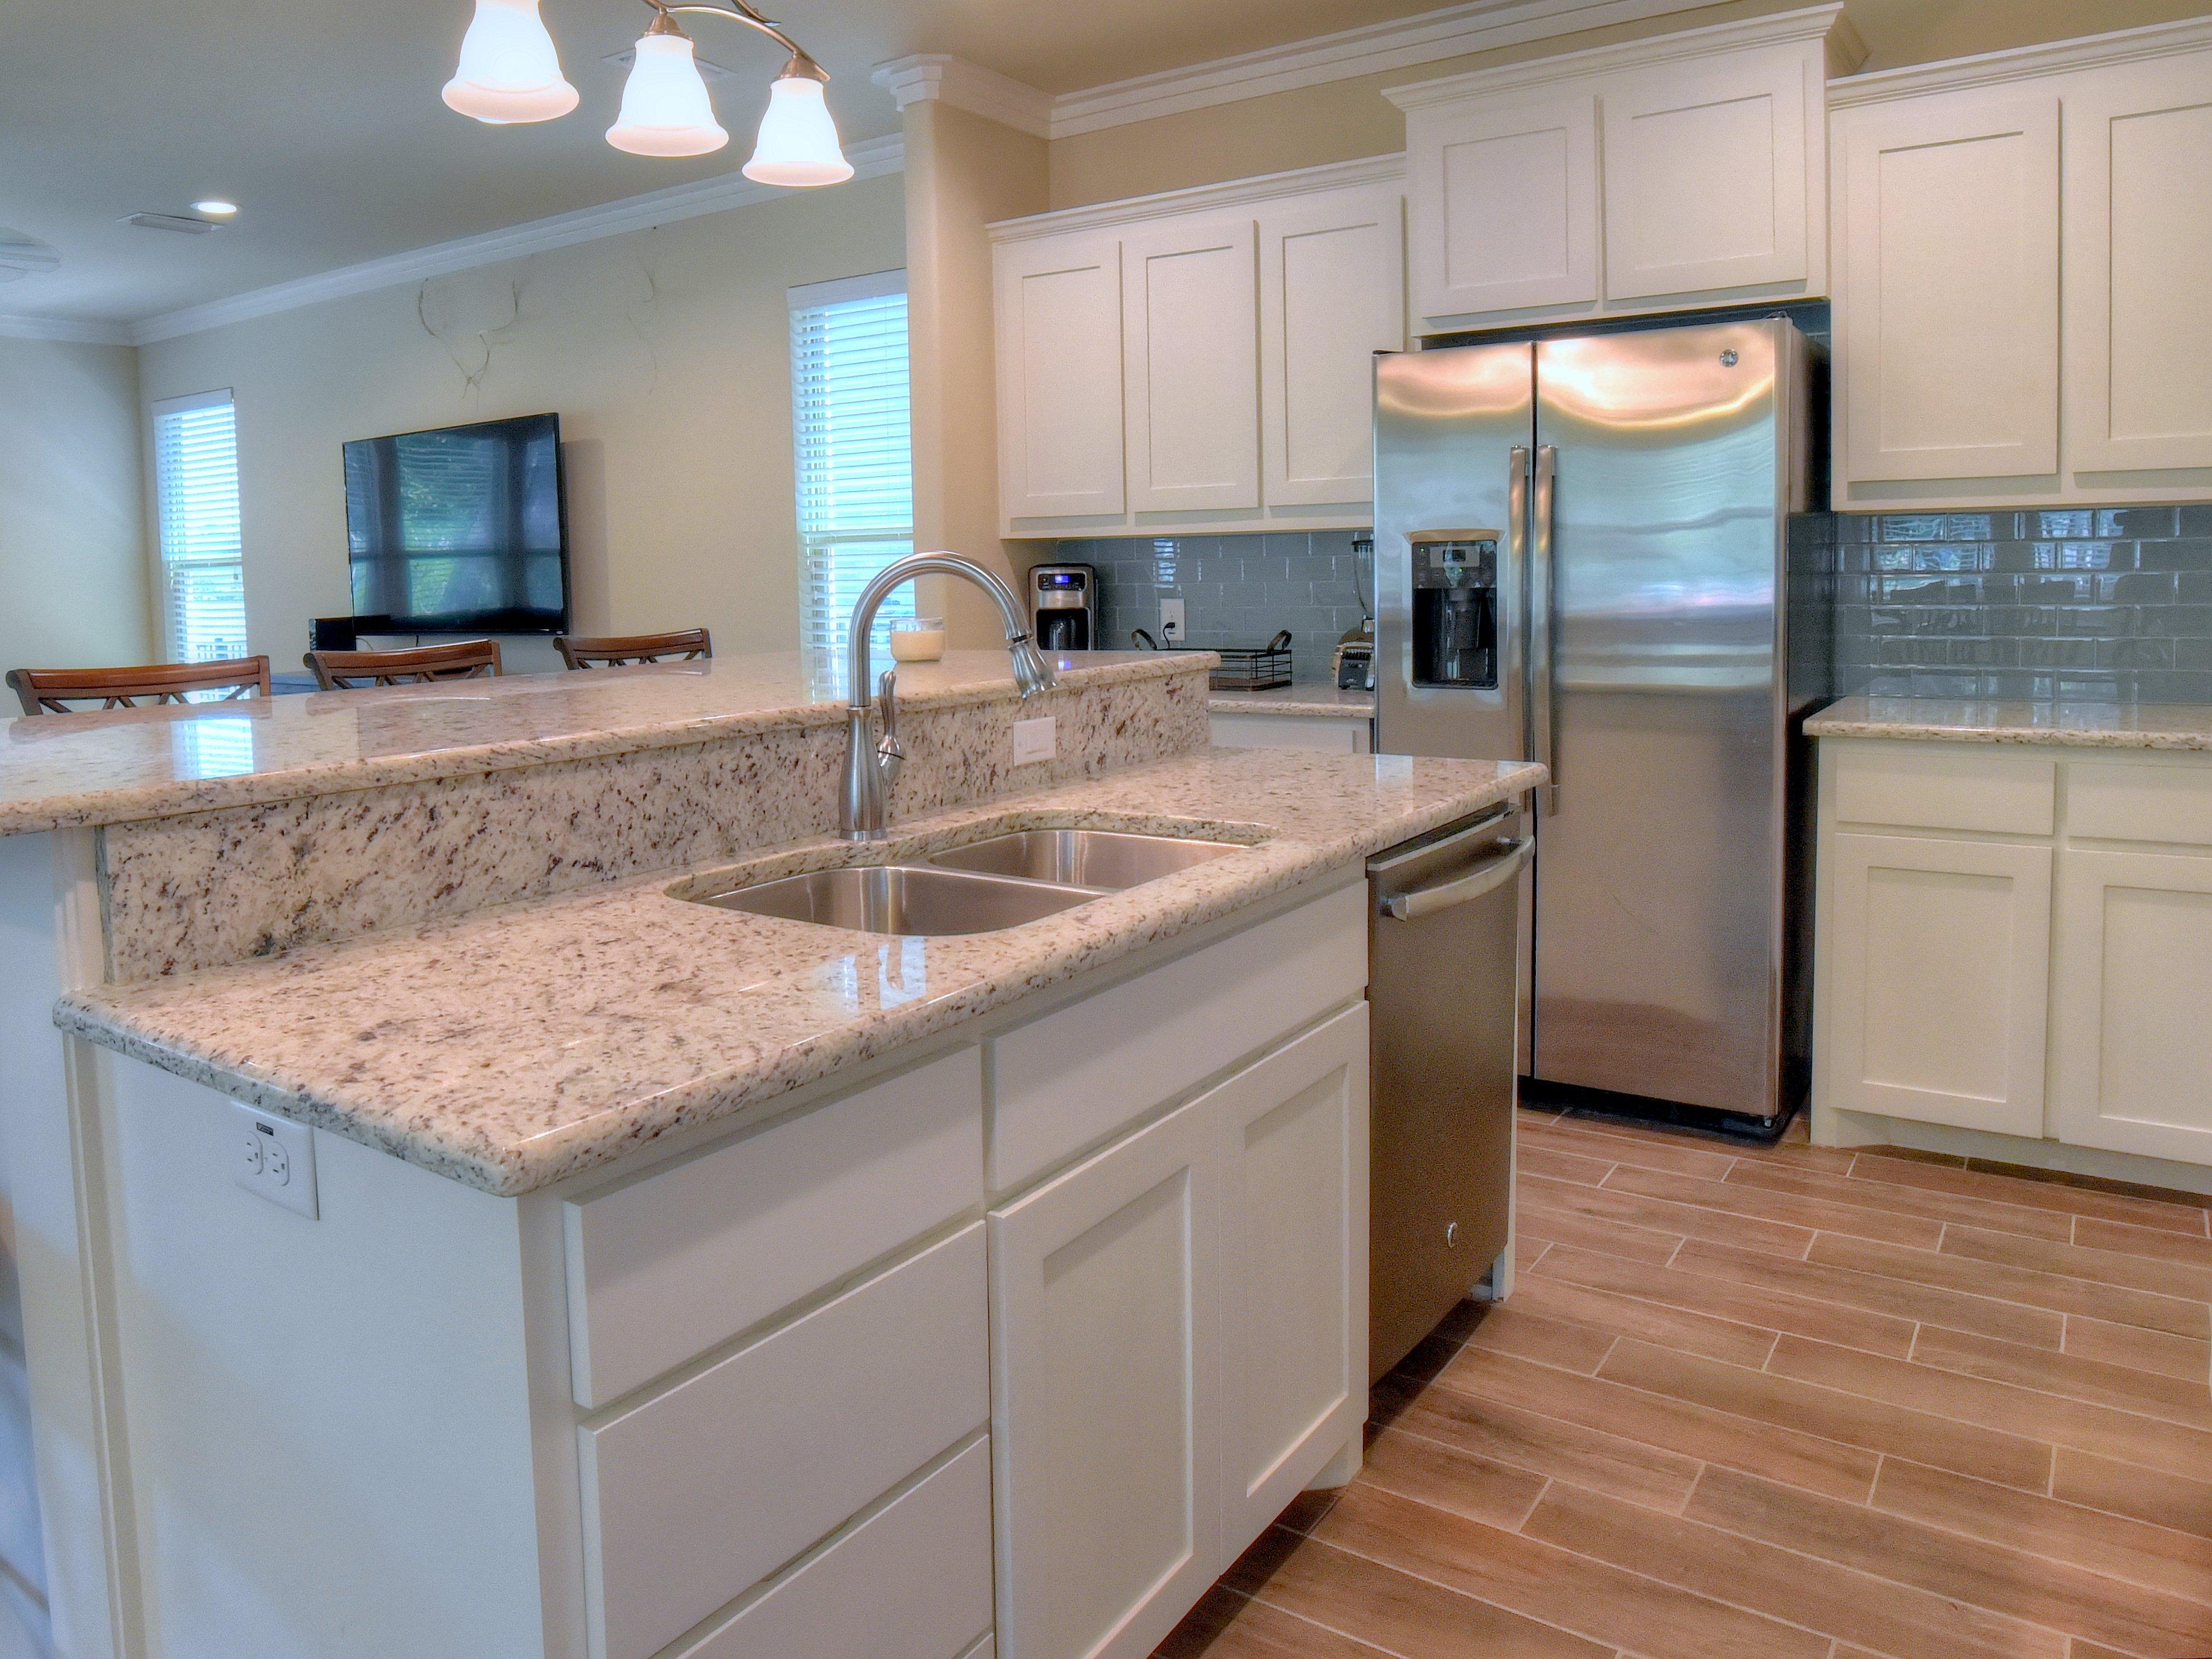 93 Beacon Point Condo rental in Sandestin Rentals ~ Cottages and Villas  in Destin Florida - #10